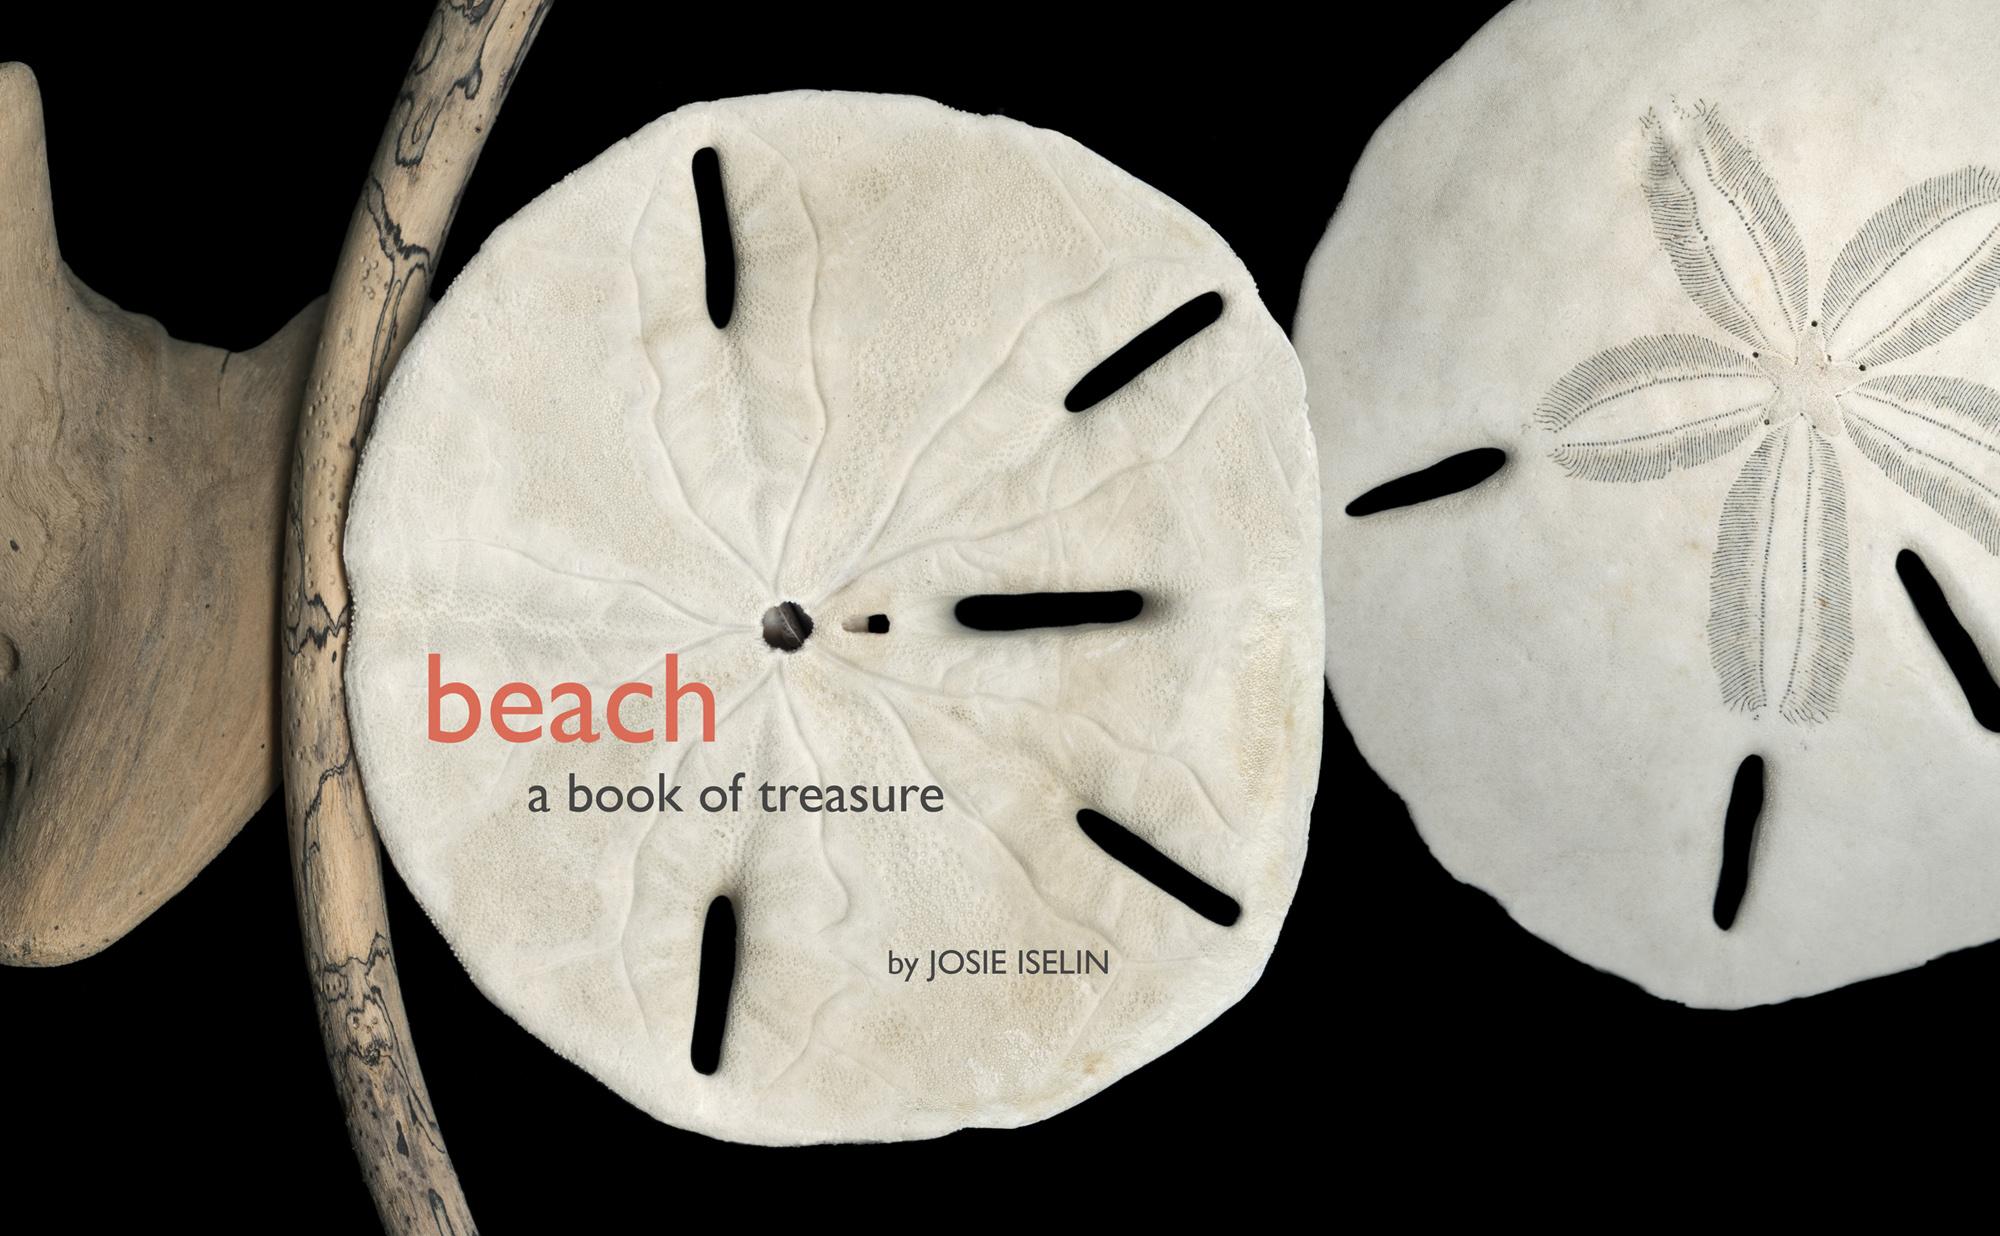 Beach: A Book of Treasure